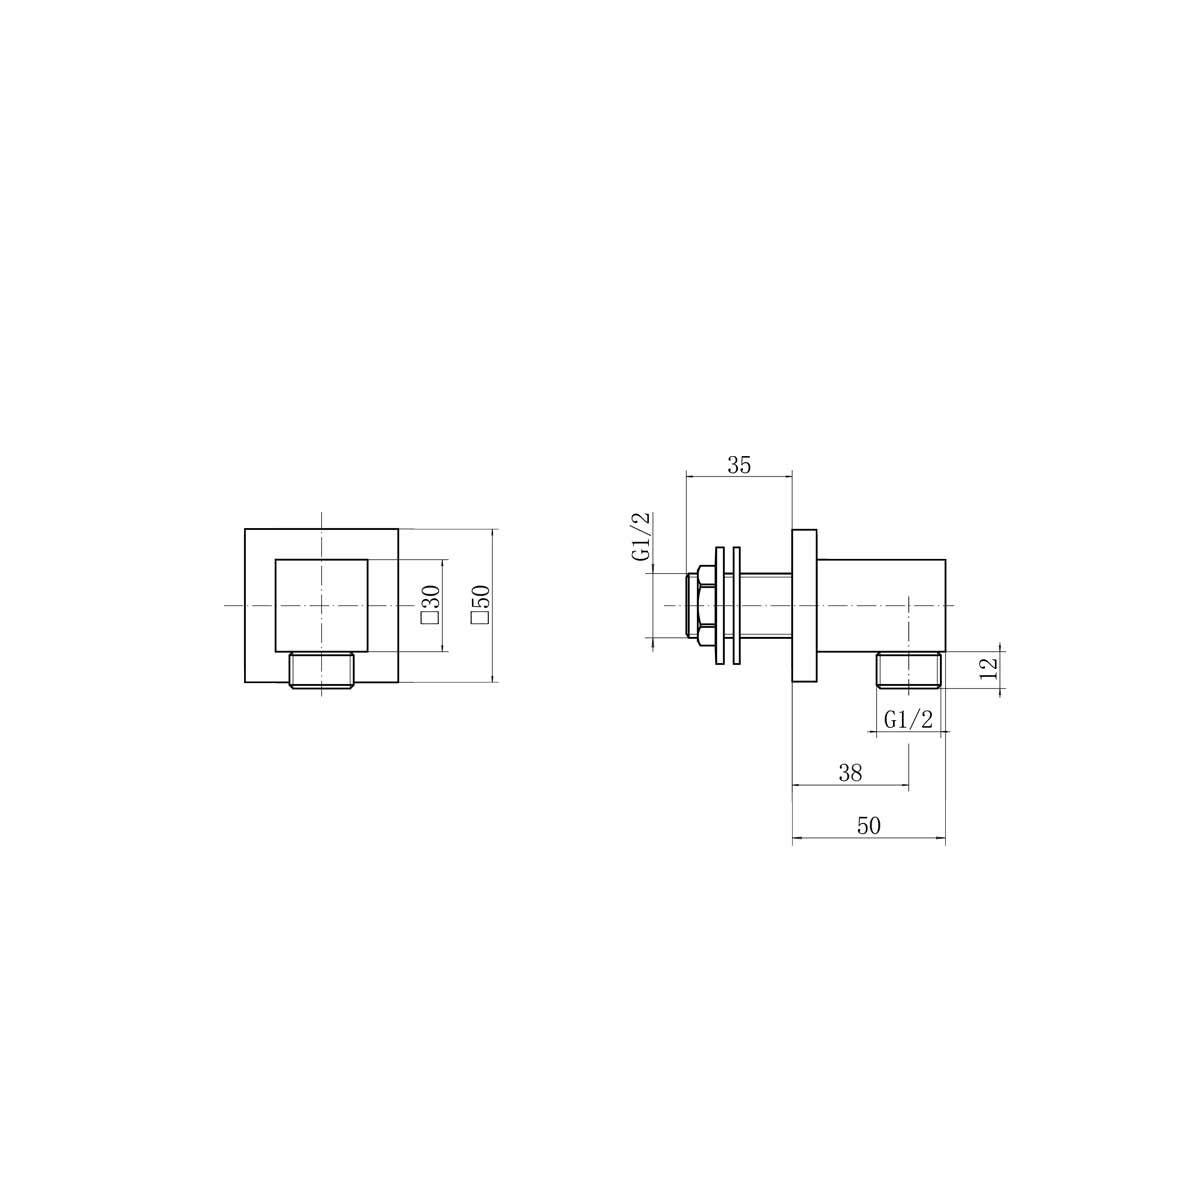 bordothermostatictwinconcealedshowervalvesystemtech1